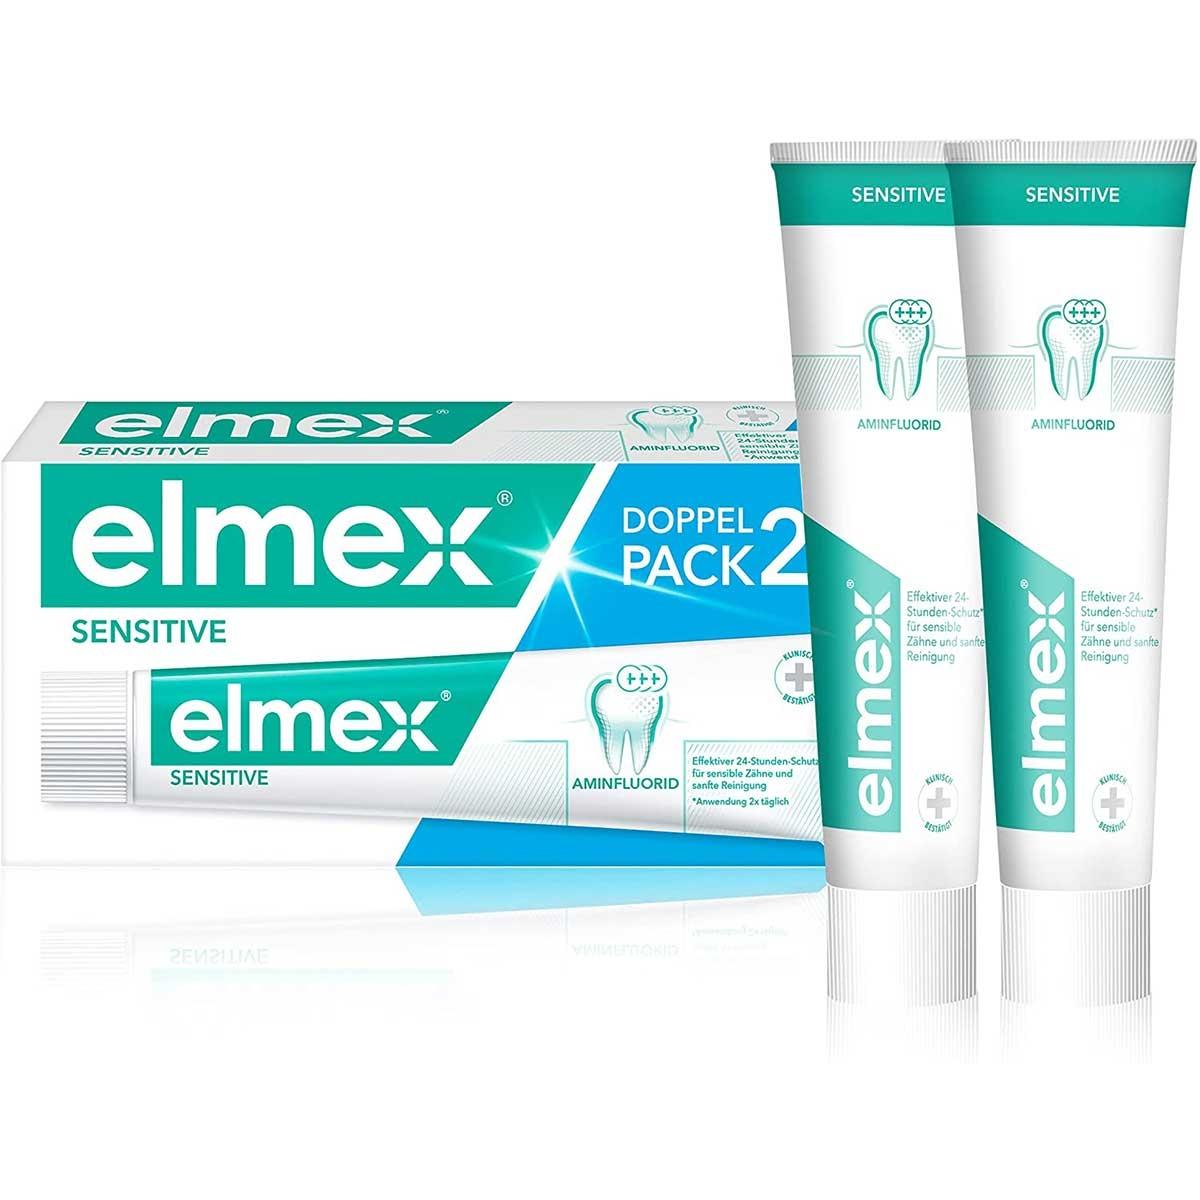 Image of Elmex sensitive pasta do zębów, dwupak